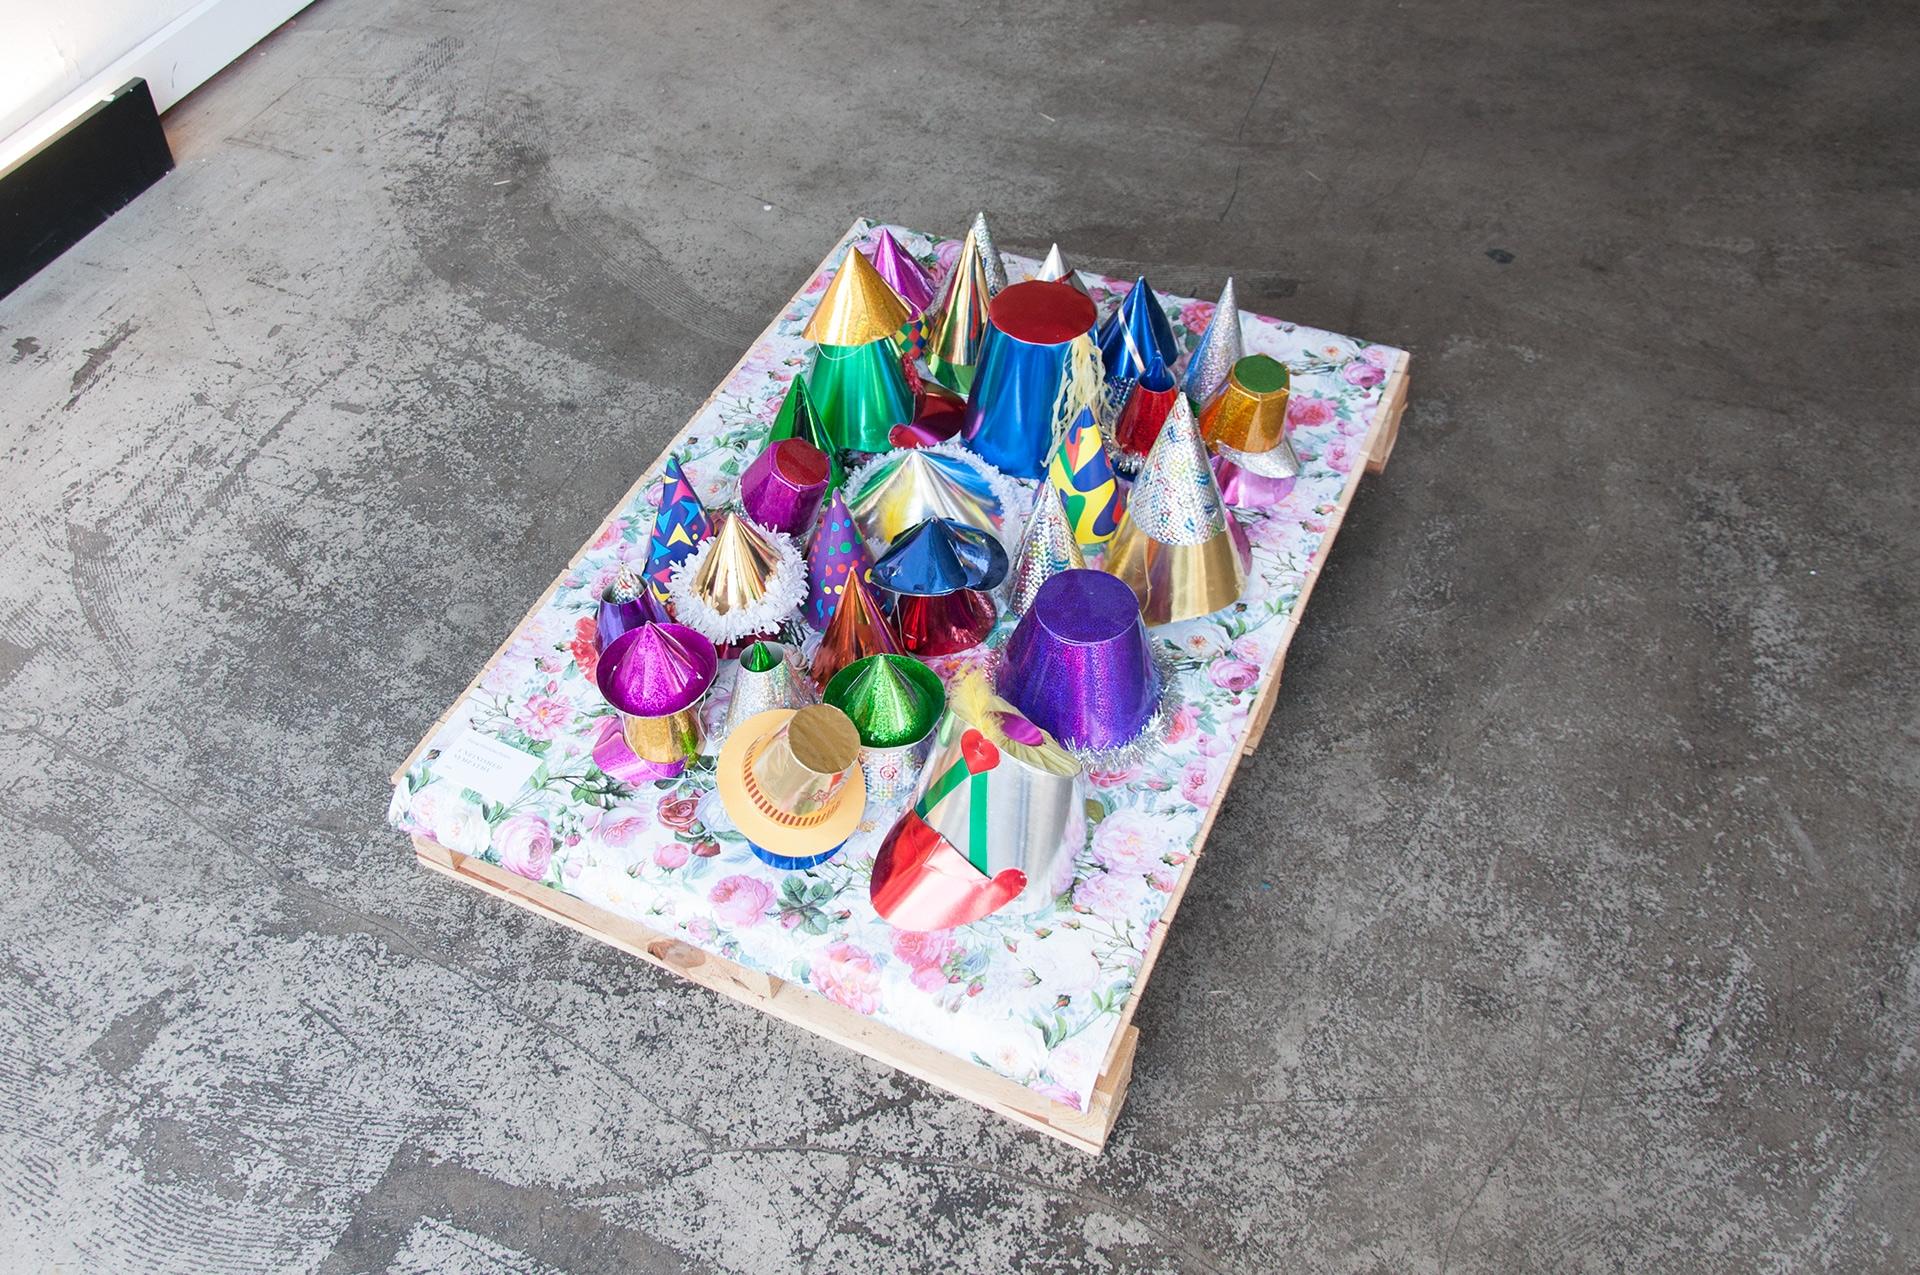 Thomas Korf Unvollende Ausstellung